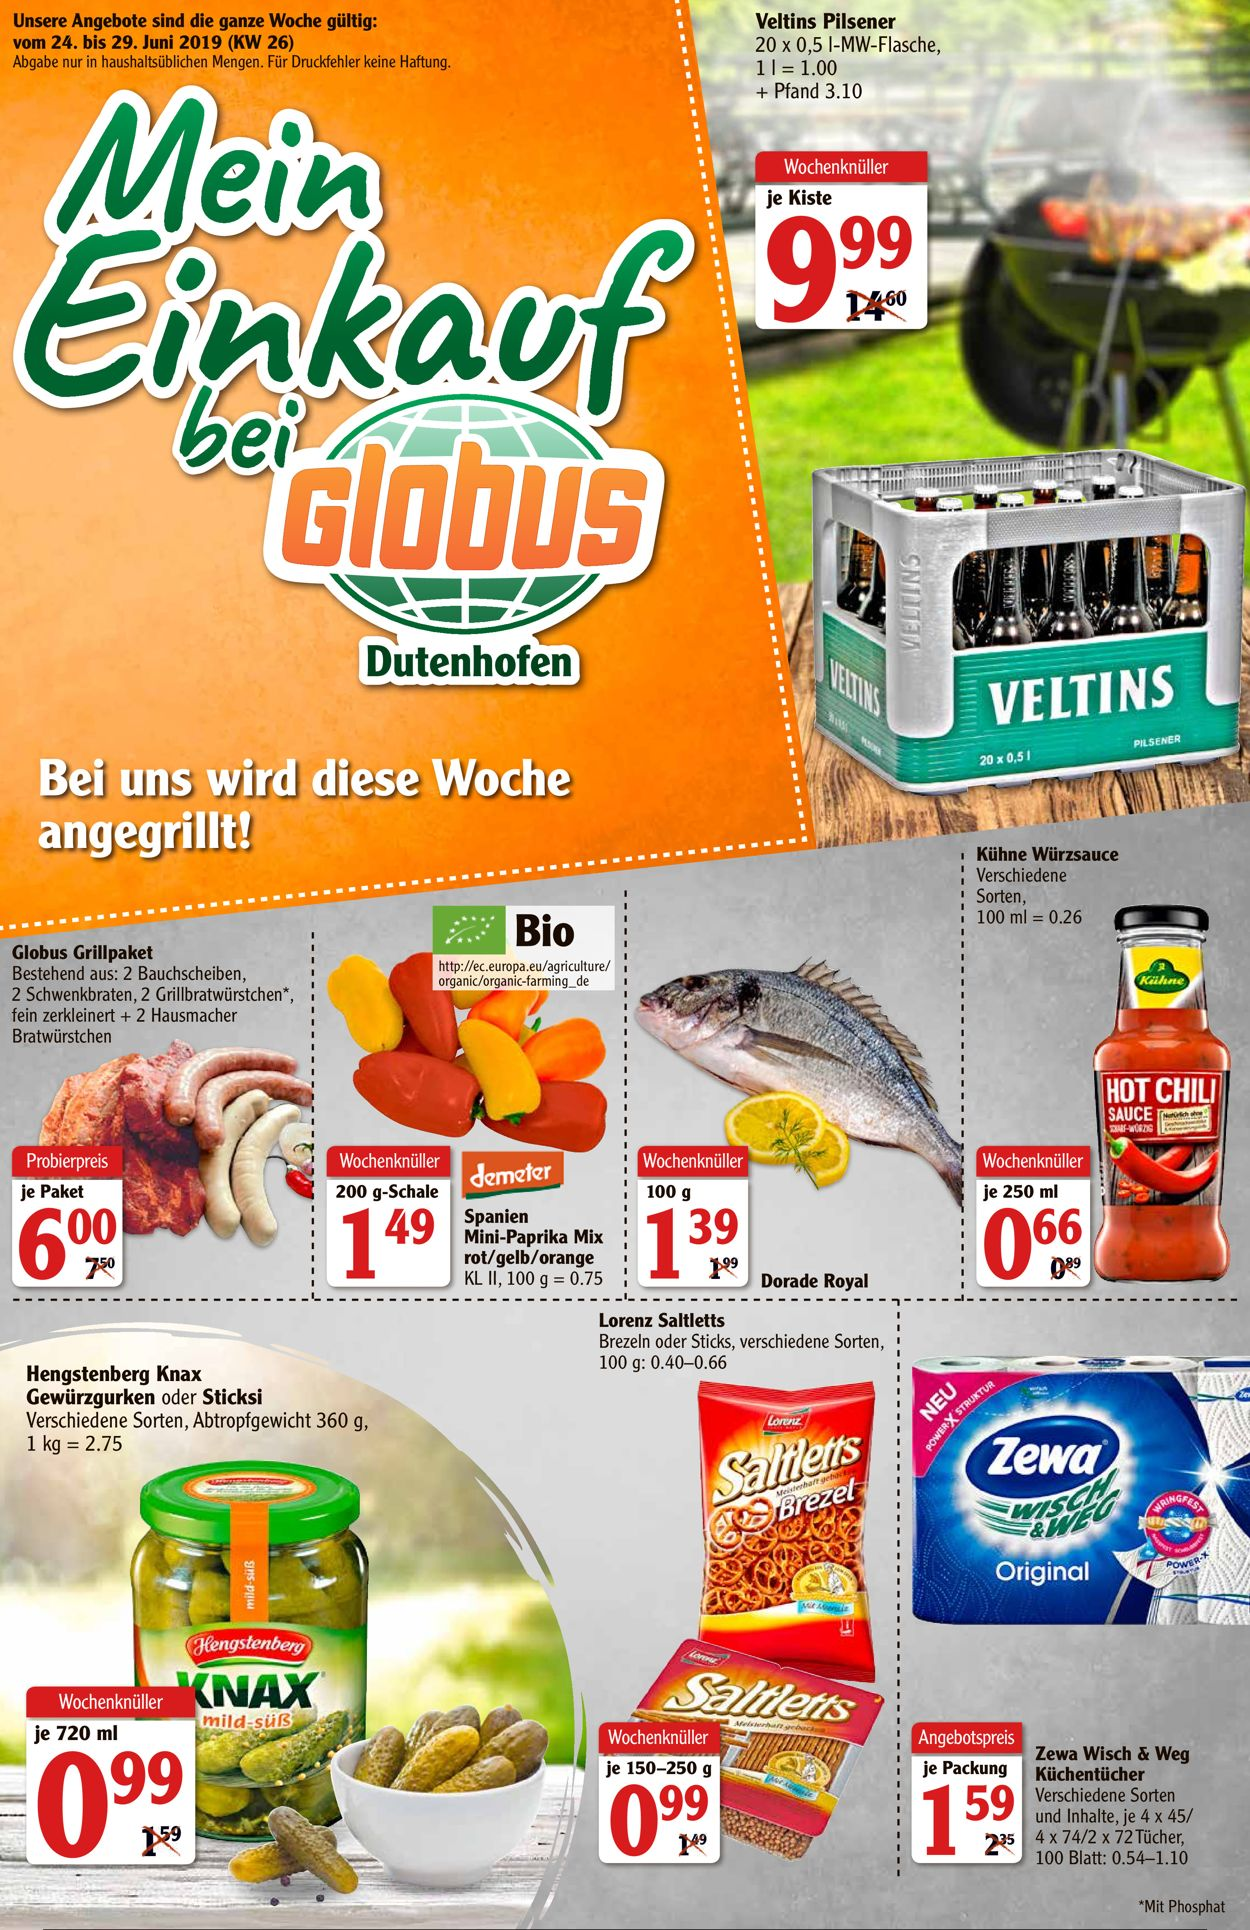 Globus Aktueller Prospekt 24.06 - 29.06.2019 - jedewoche-rabatte.de